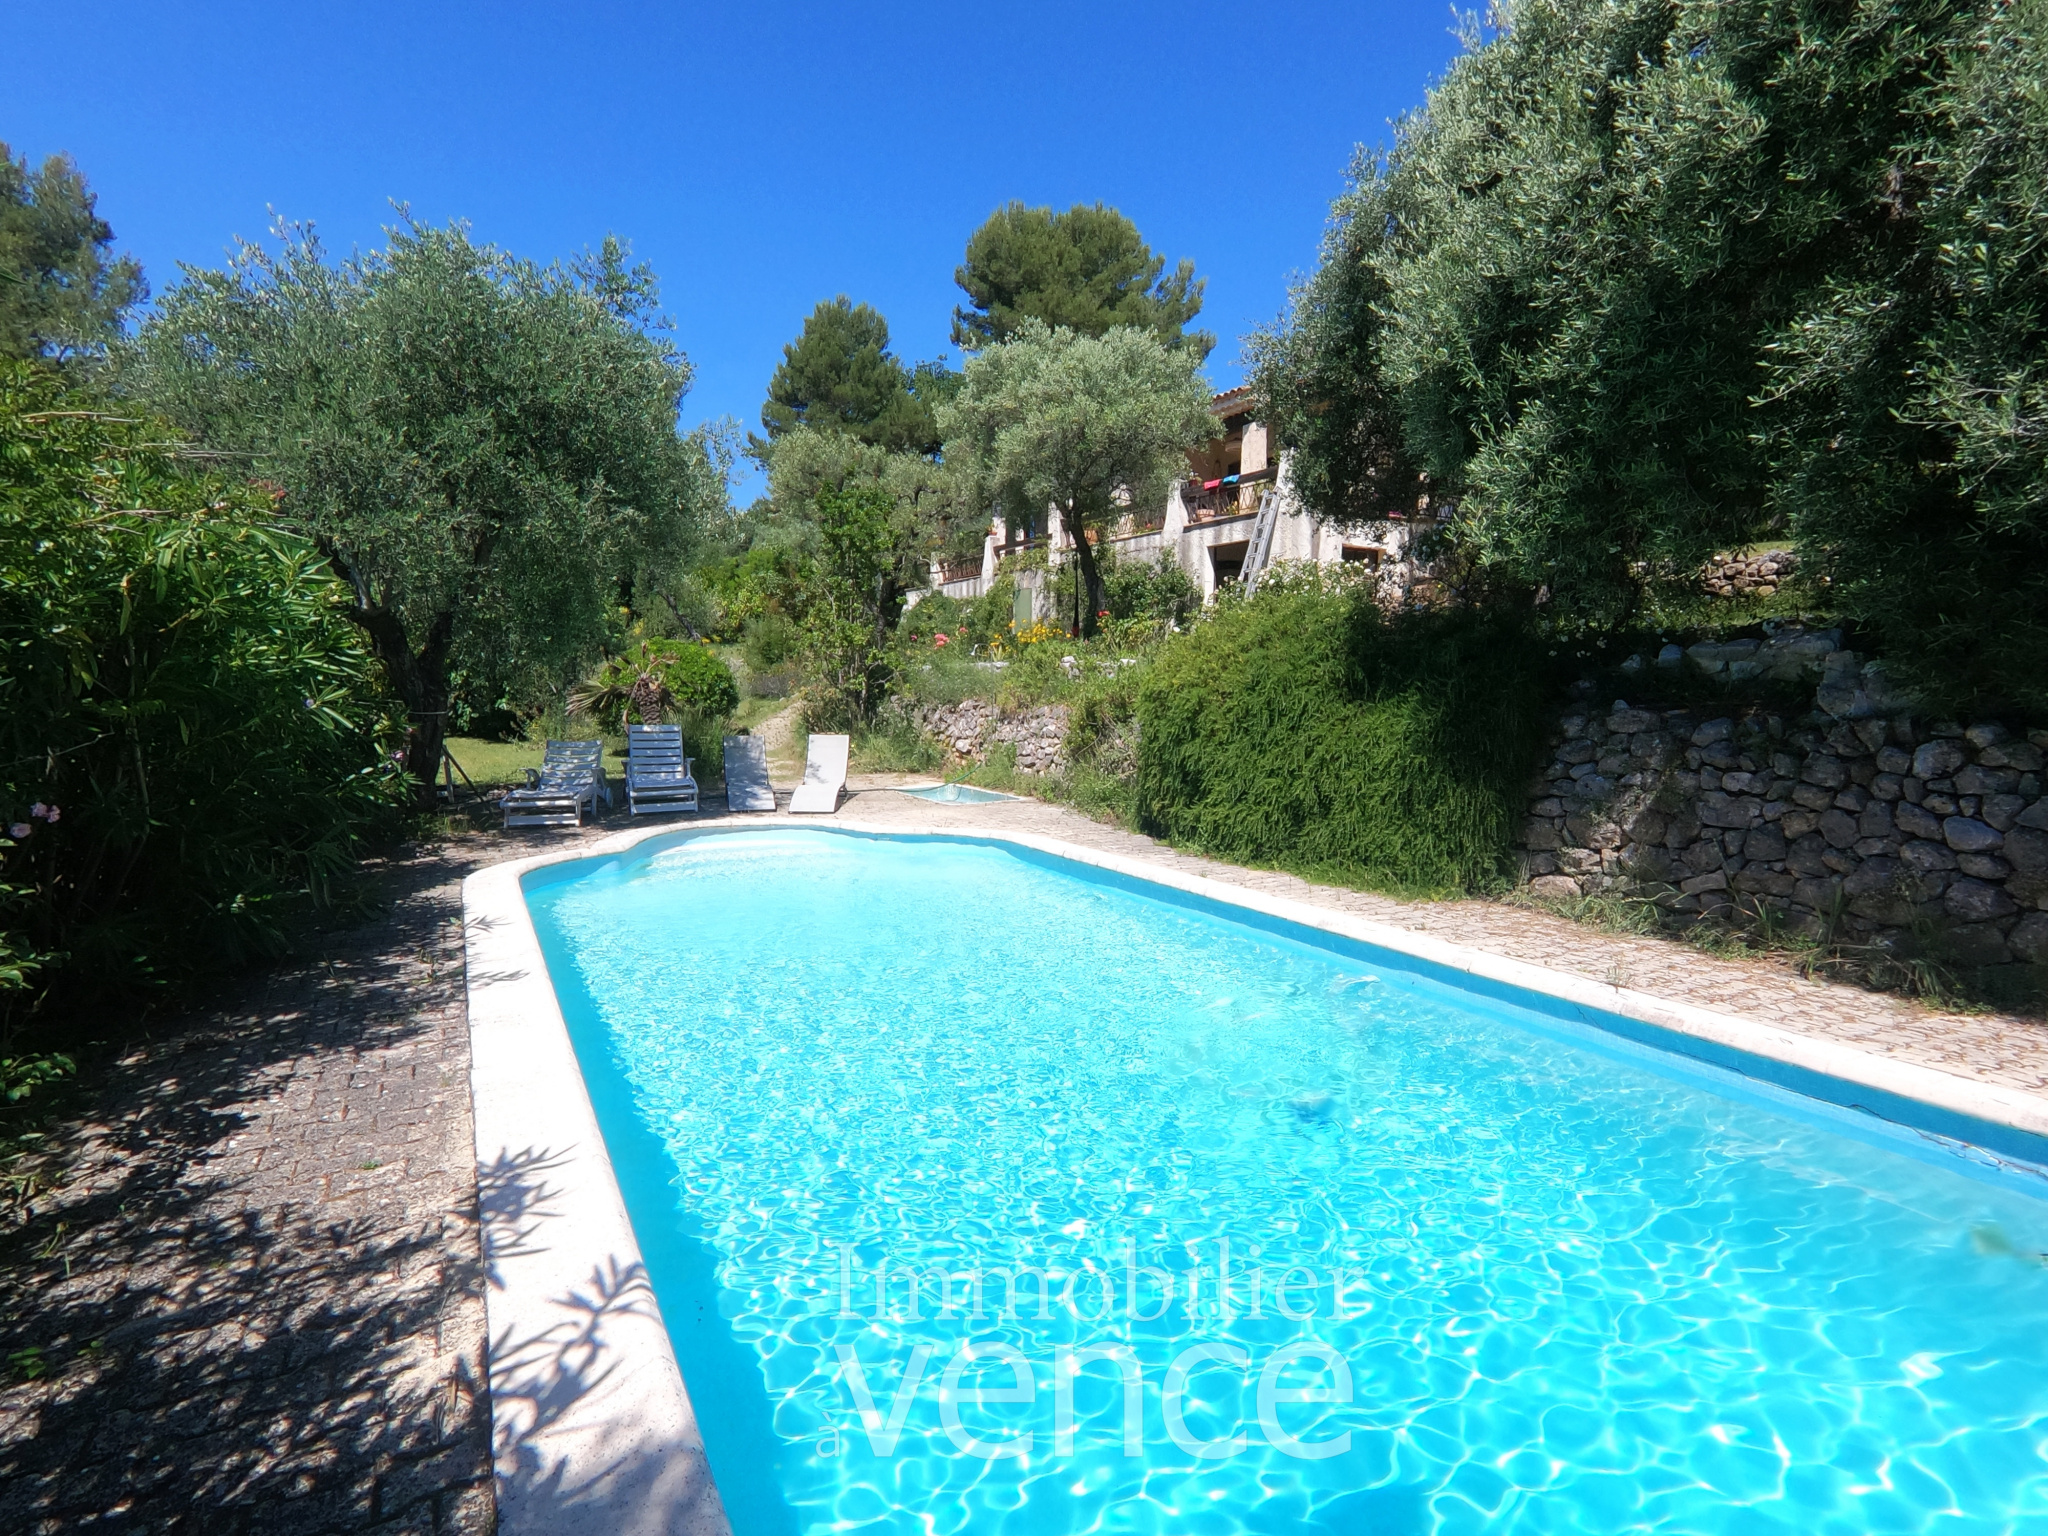 Spacious Provençal Villa, surrounded in a natural environment